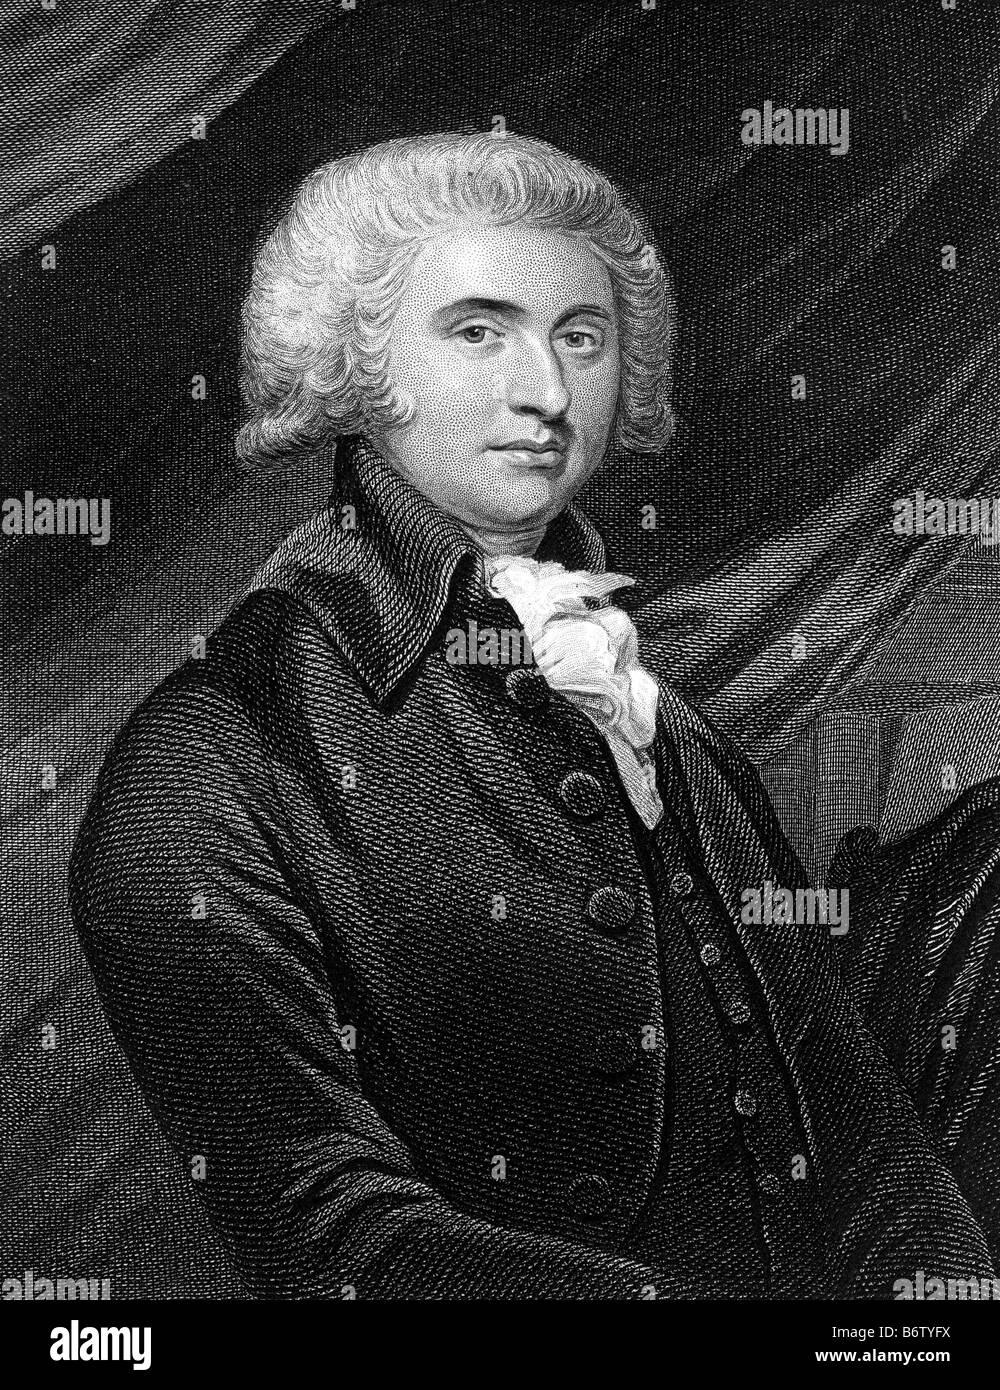 THOMAS ERSKINE Scottish jurist 1750-1823 - Stock Image